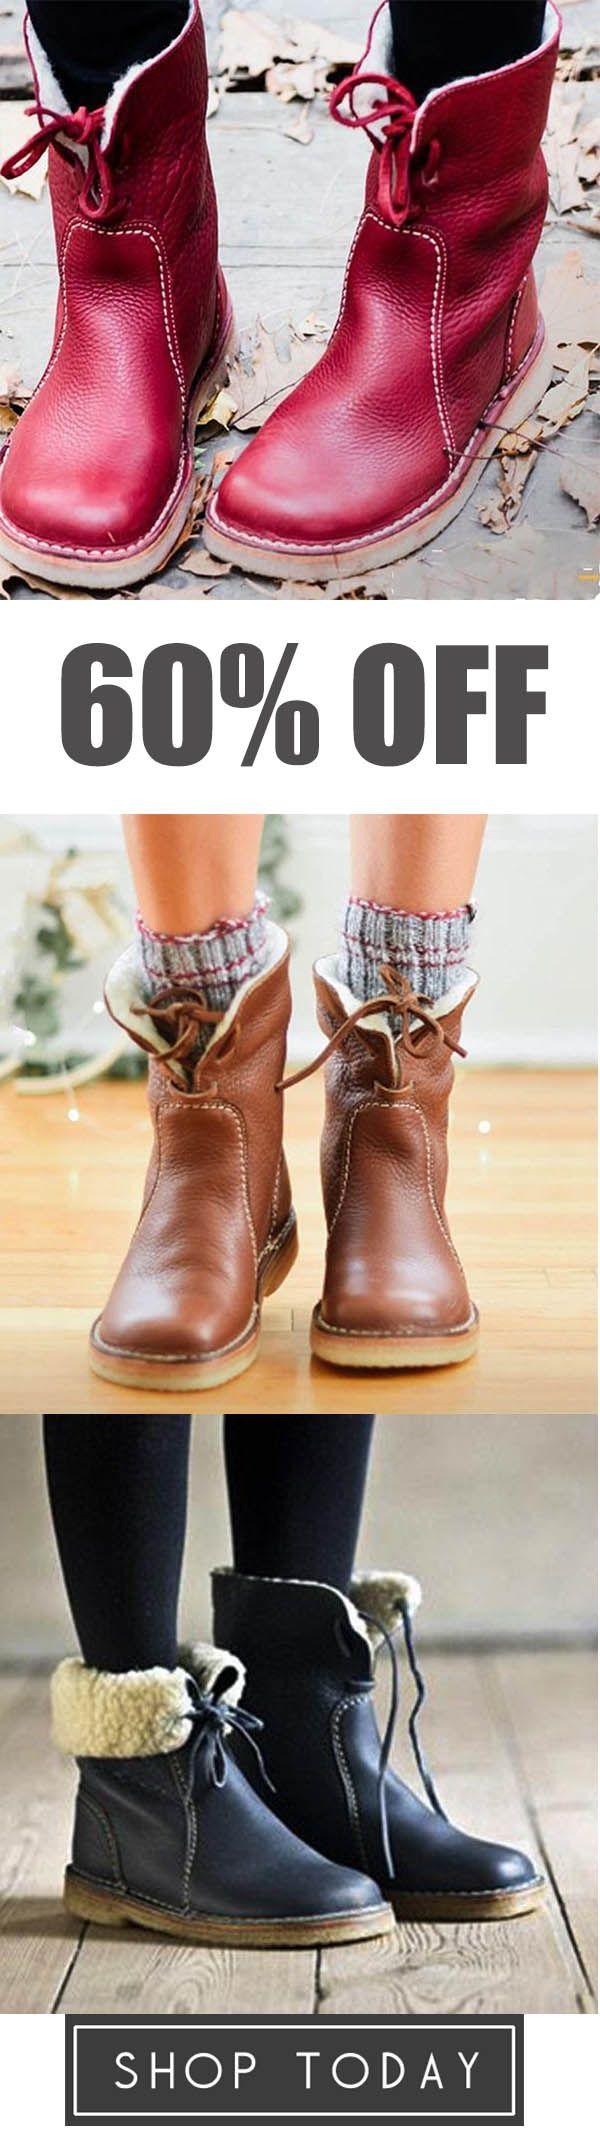 Judedress Super Soft Lapelable Boots